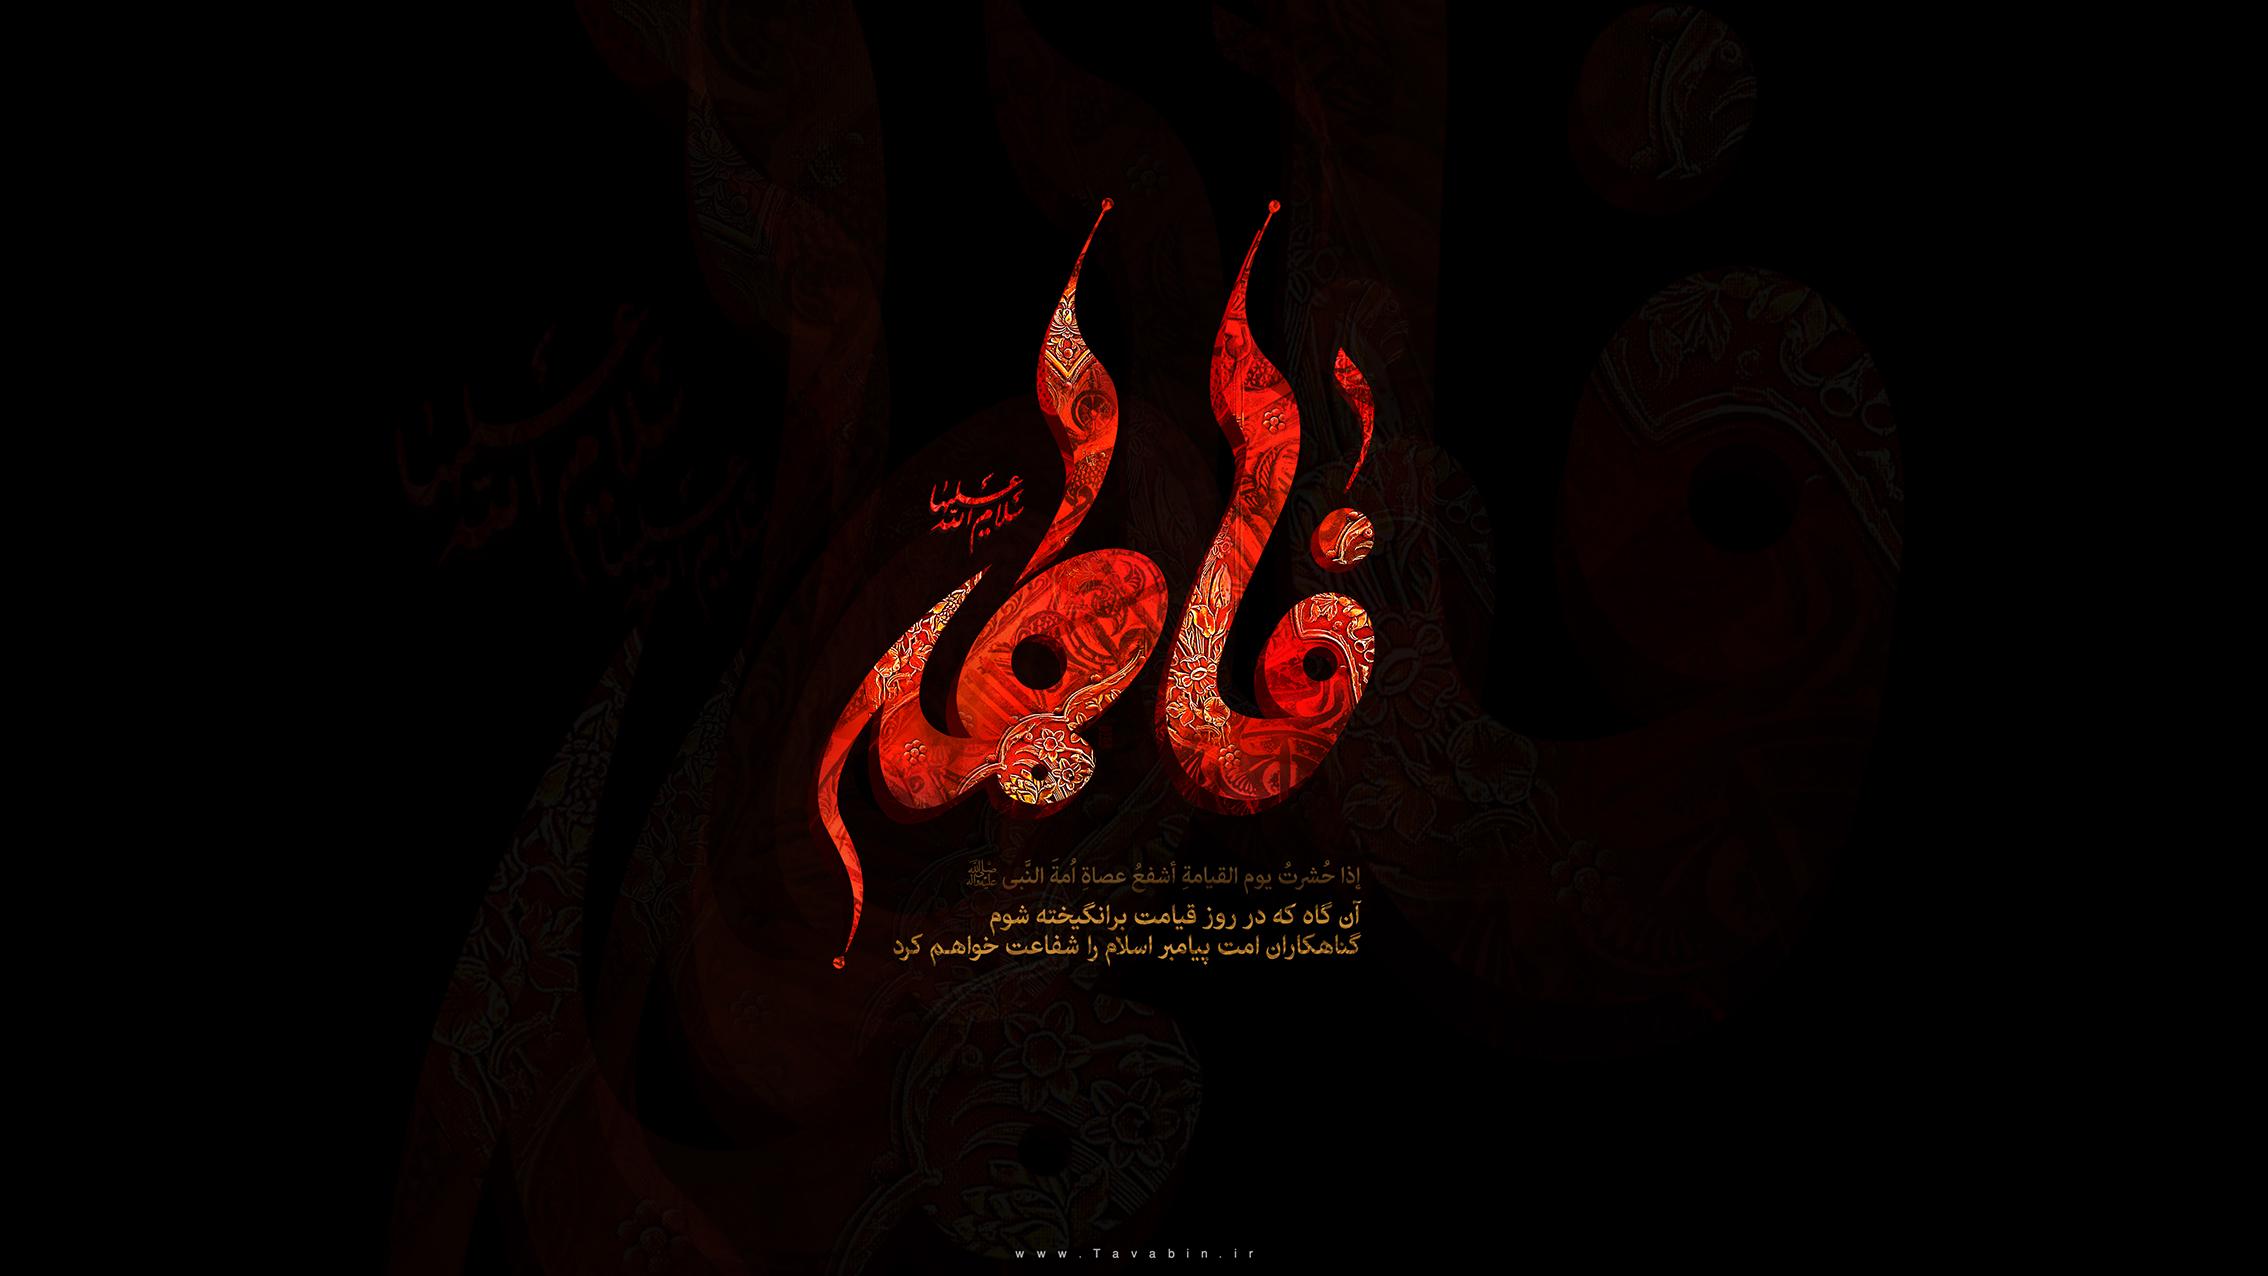 fatemieh_calligraphy_tavabin